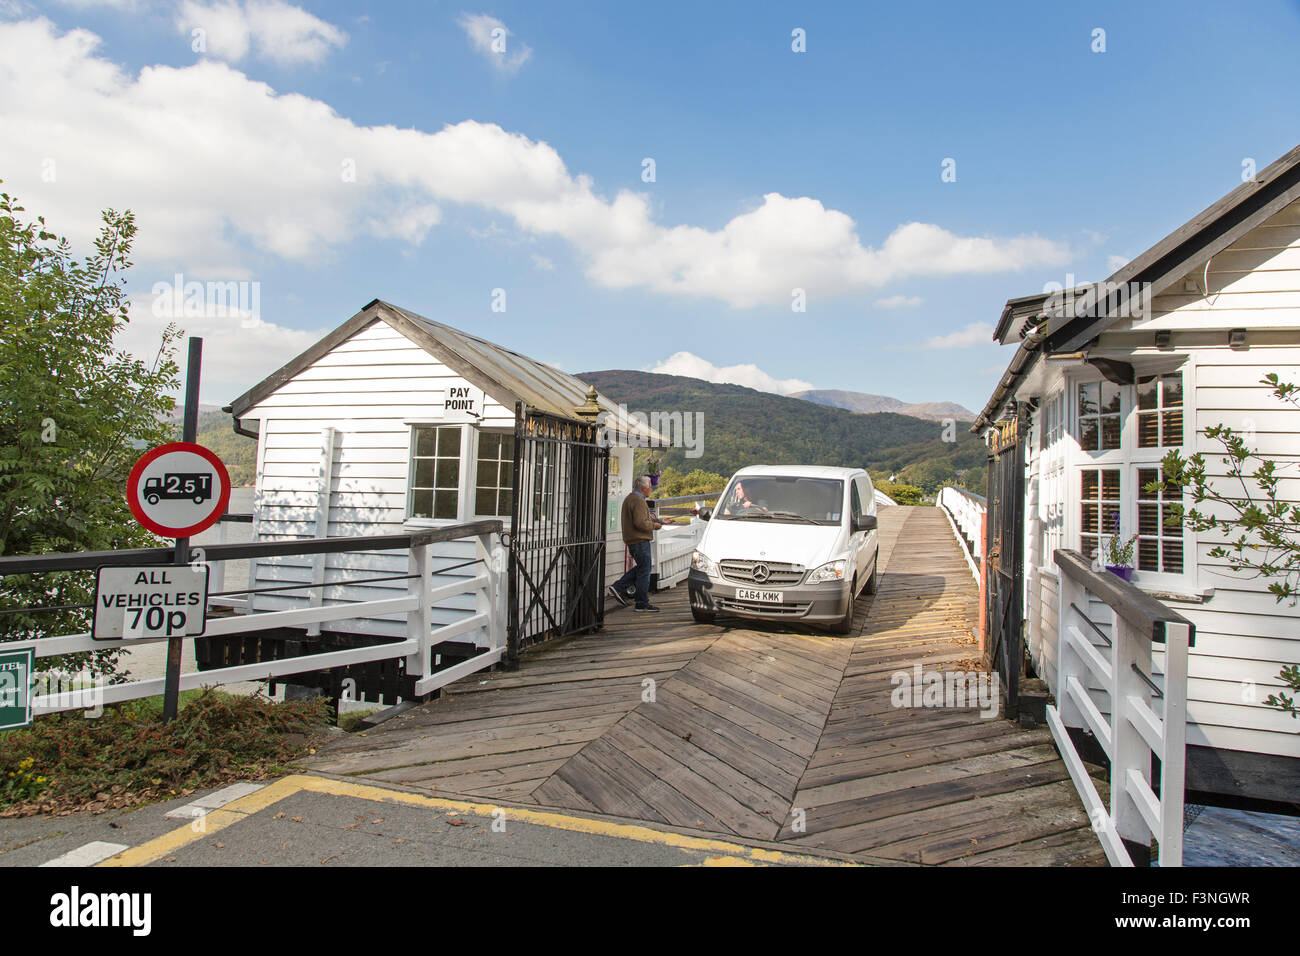 Penmaenpool wooden toll bridge crossing the River Mawddach, Snowdonia National Park, Gwynedd, North Wales, UK - Stock Image